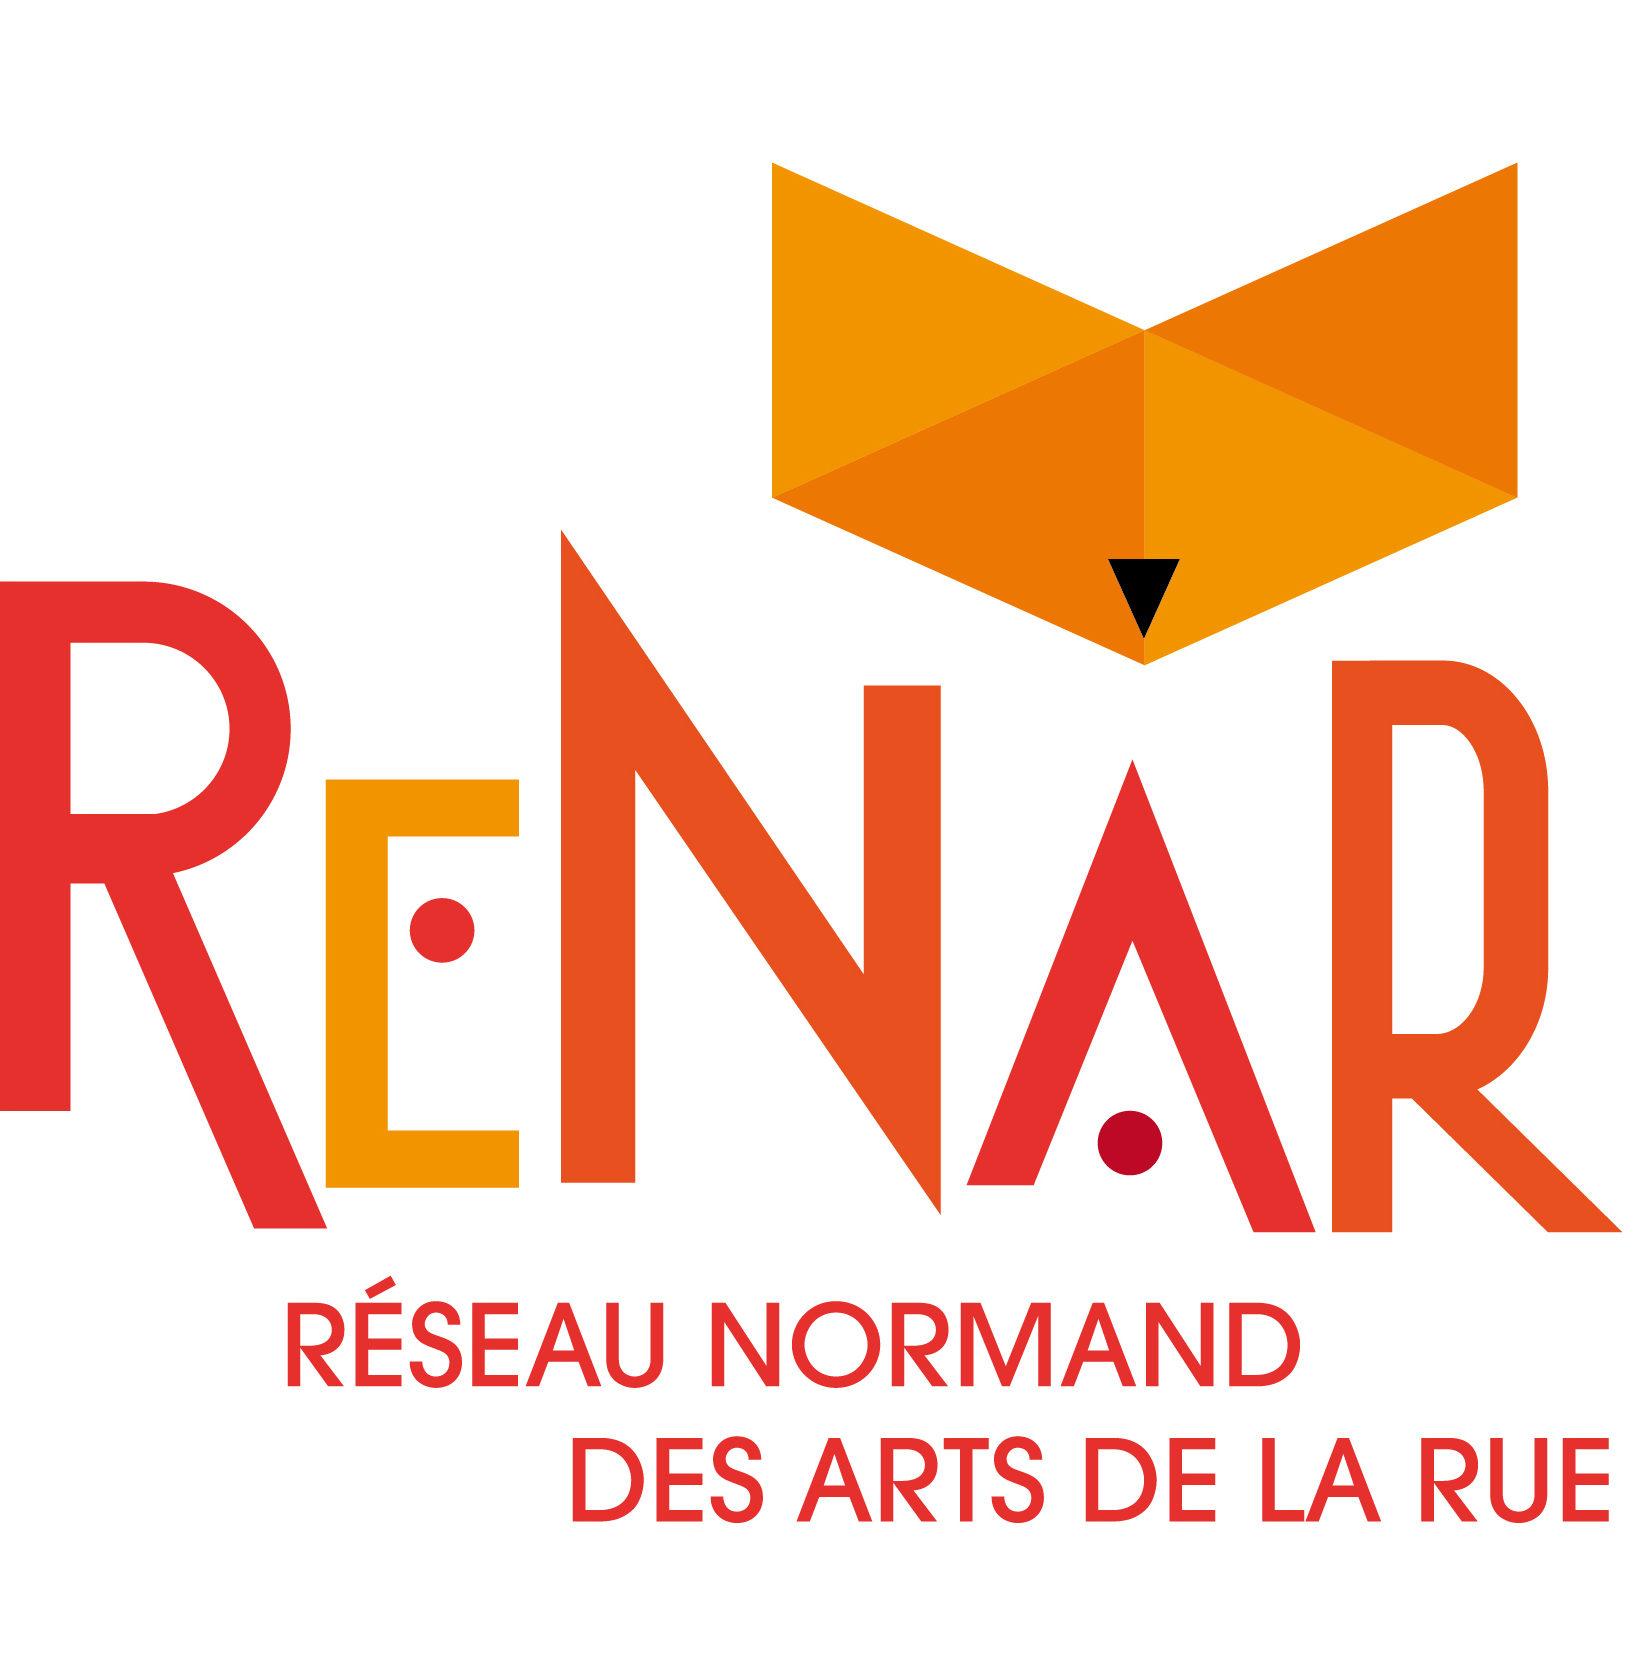 Réseau Normand des Arts de la Rue